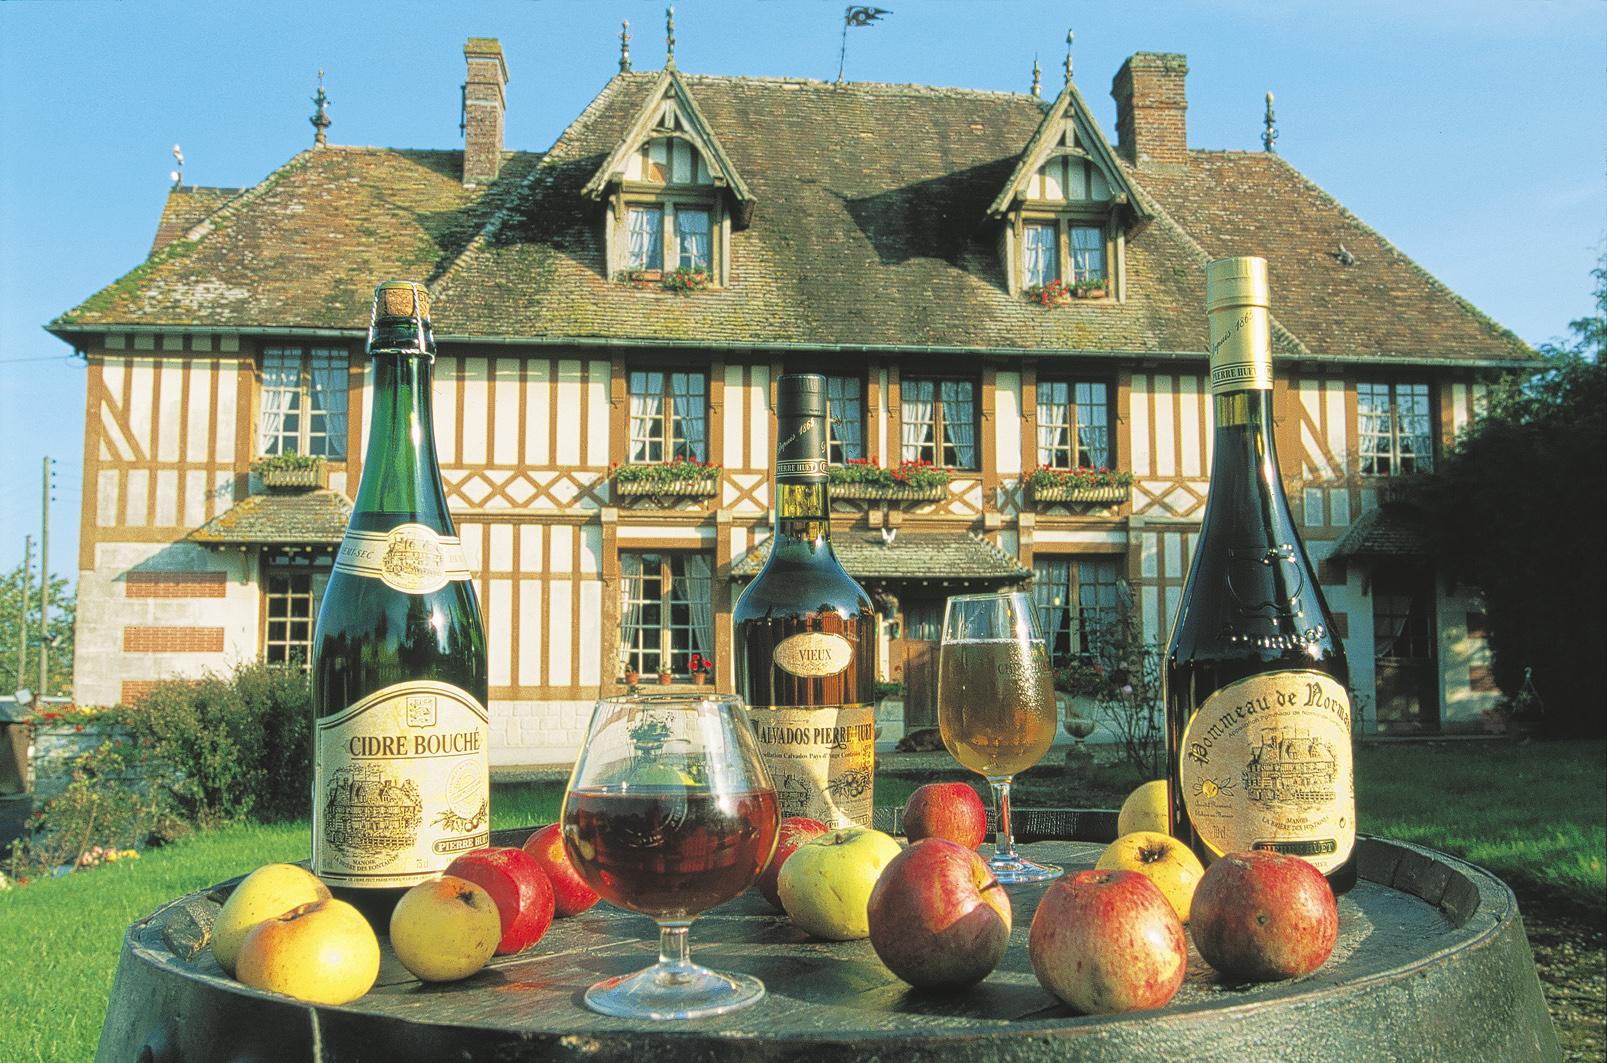 Choisir un restaurant à Rouen